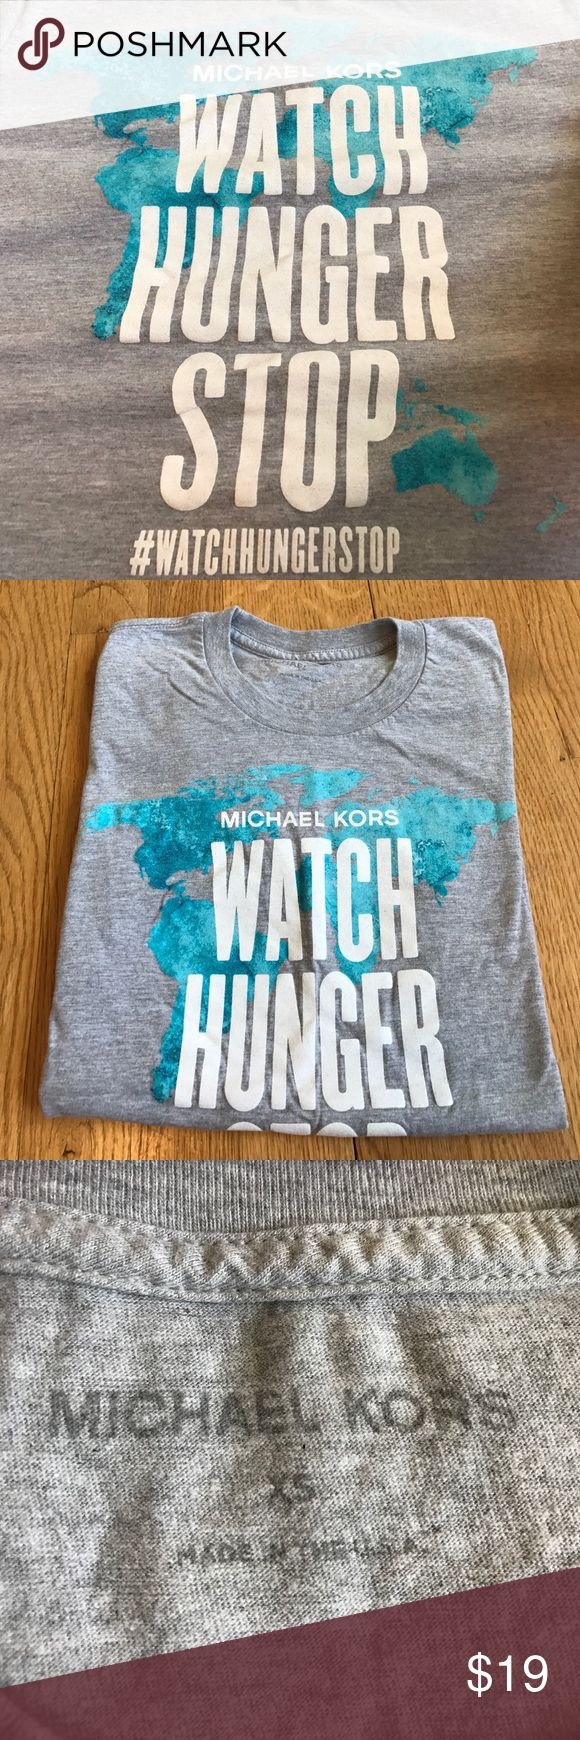 "Michael Kors Tshirt Silkscreened Michael Kors T Shirt, printed with phrase "" Watch hunger stop"" , worn once or twice , like new Michael Kors Tops Tees - Short Sleeve"